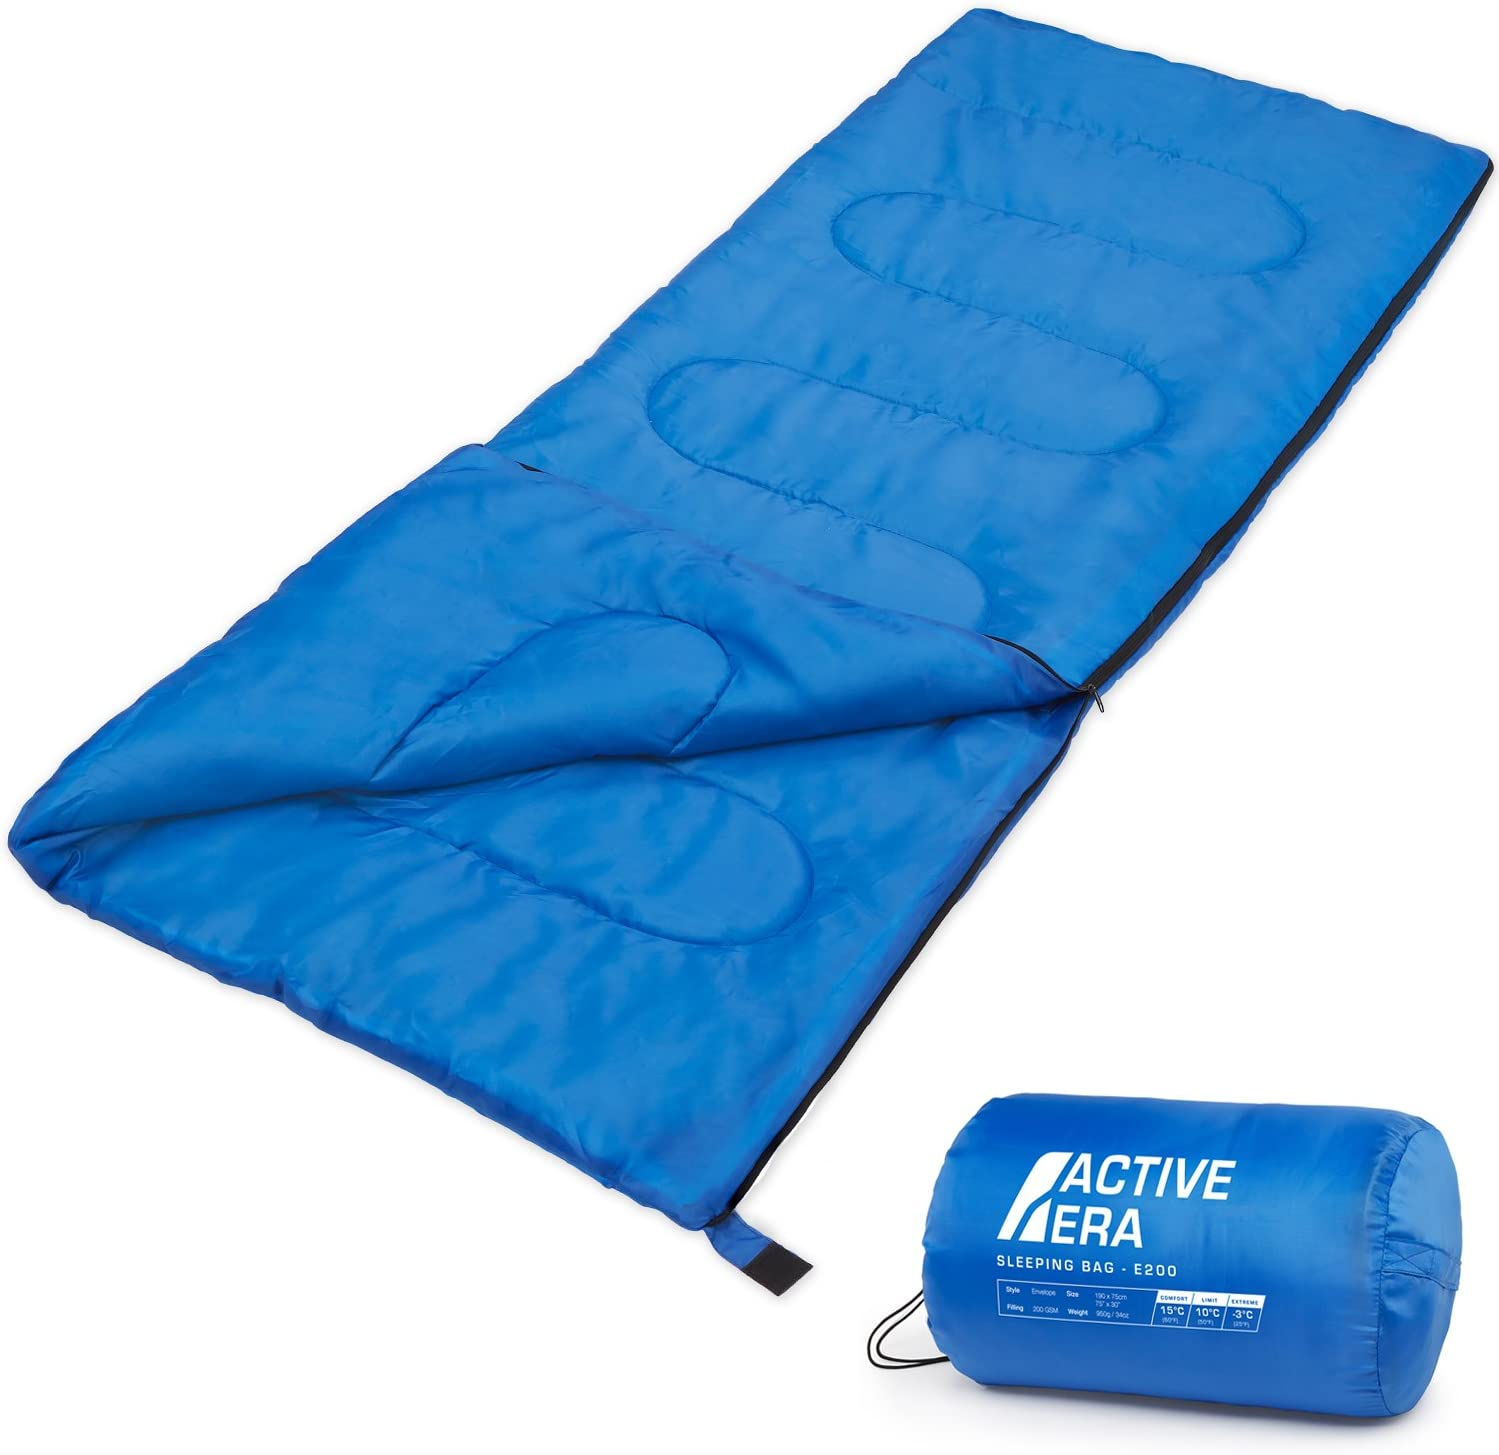 Active Era Saco de Dormir Premium 200, de Forma Rectangular ...